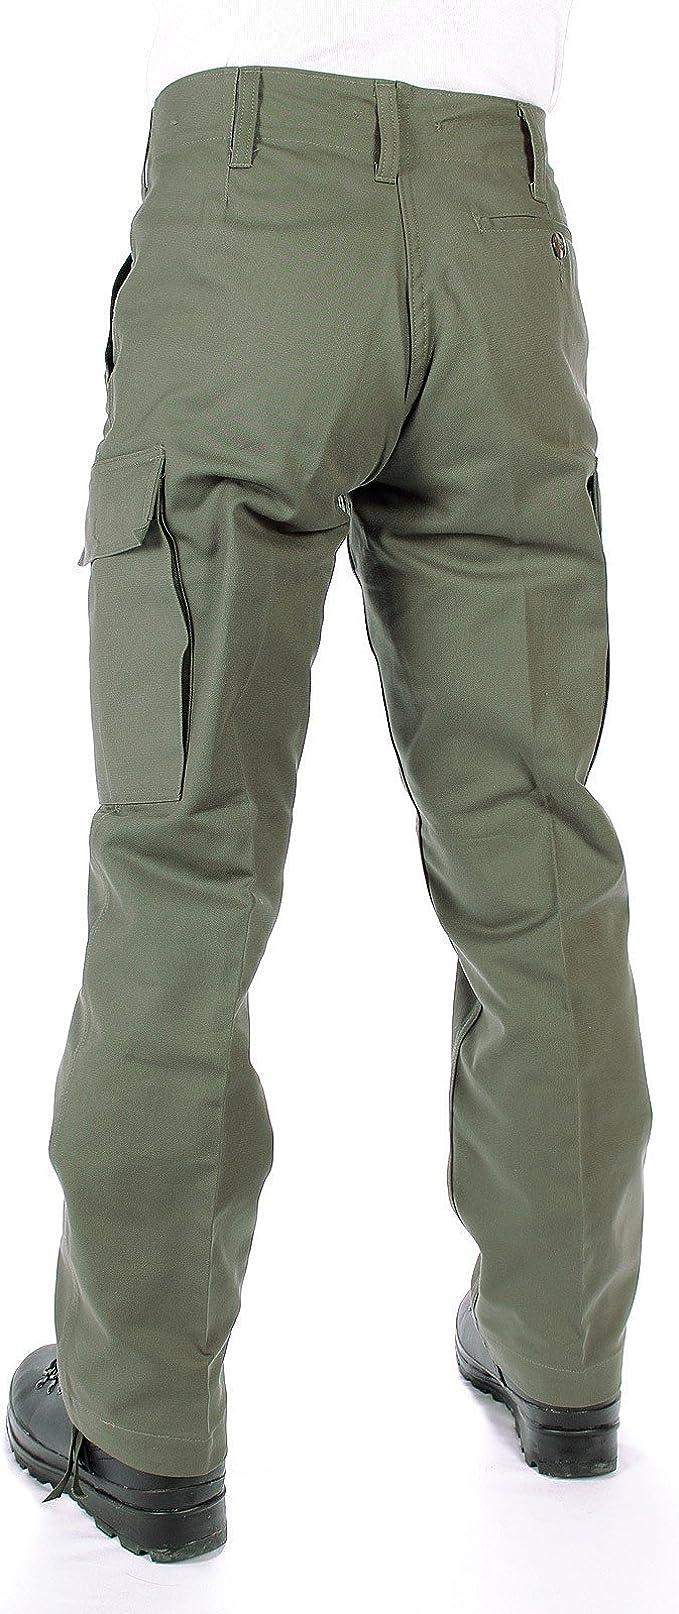 BW MOLESKIN HOSE Feldhose Bundeswehr Arbeitshose Original nach TL Army Outdoor